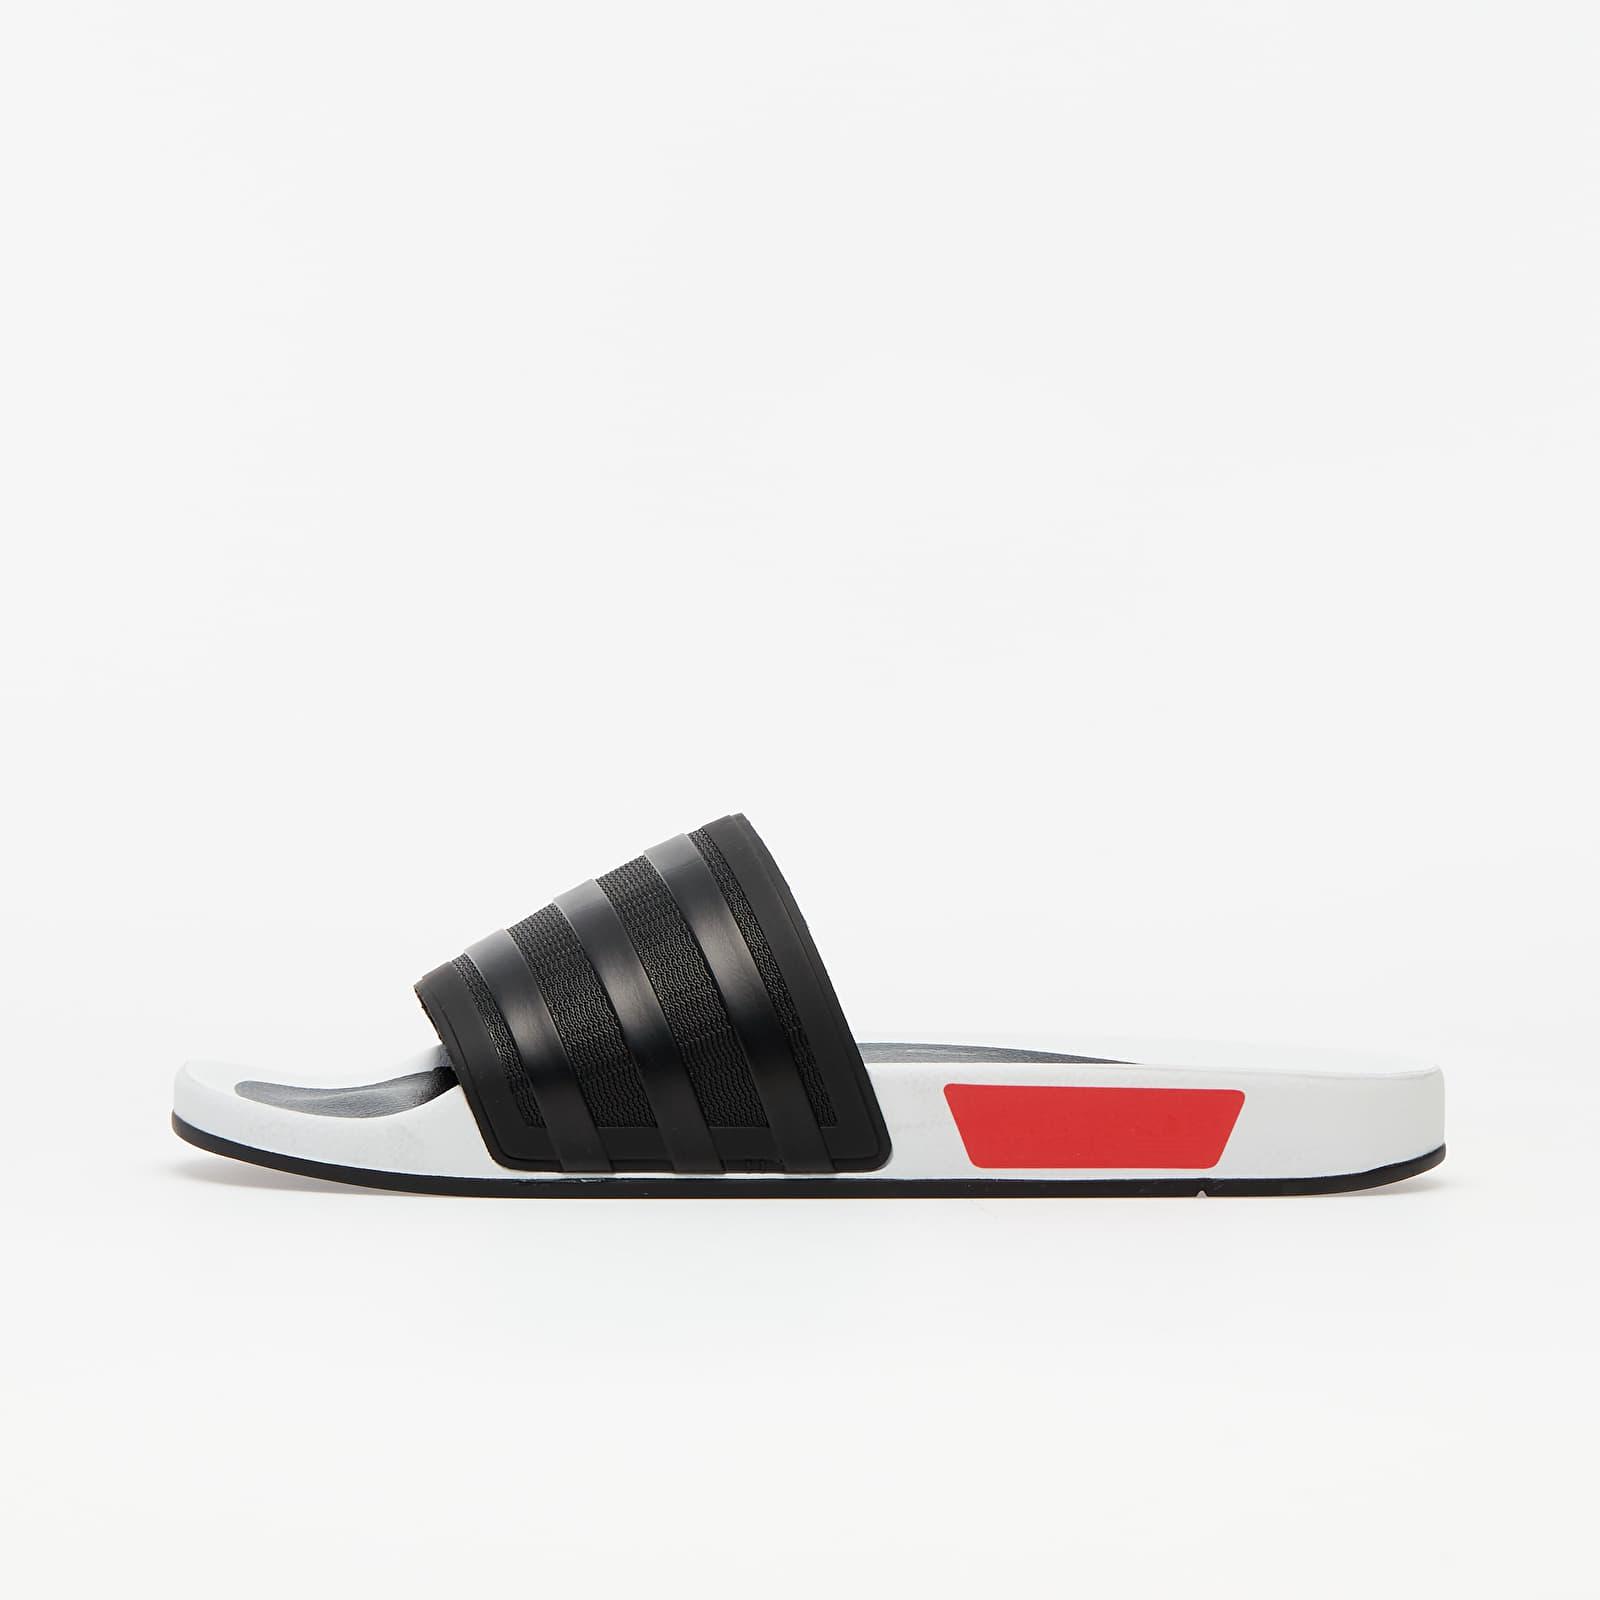 Pánske tenisky a topánky adidas Adilette Premium Core Black/ Lust Blue/ Lust Red